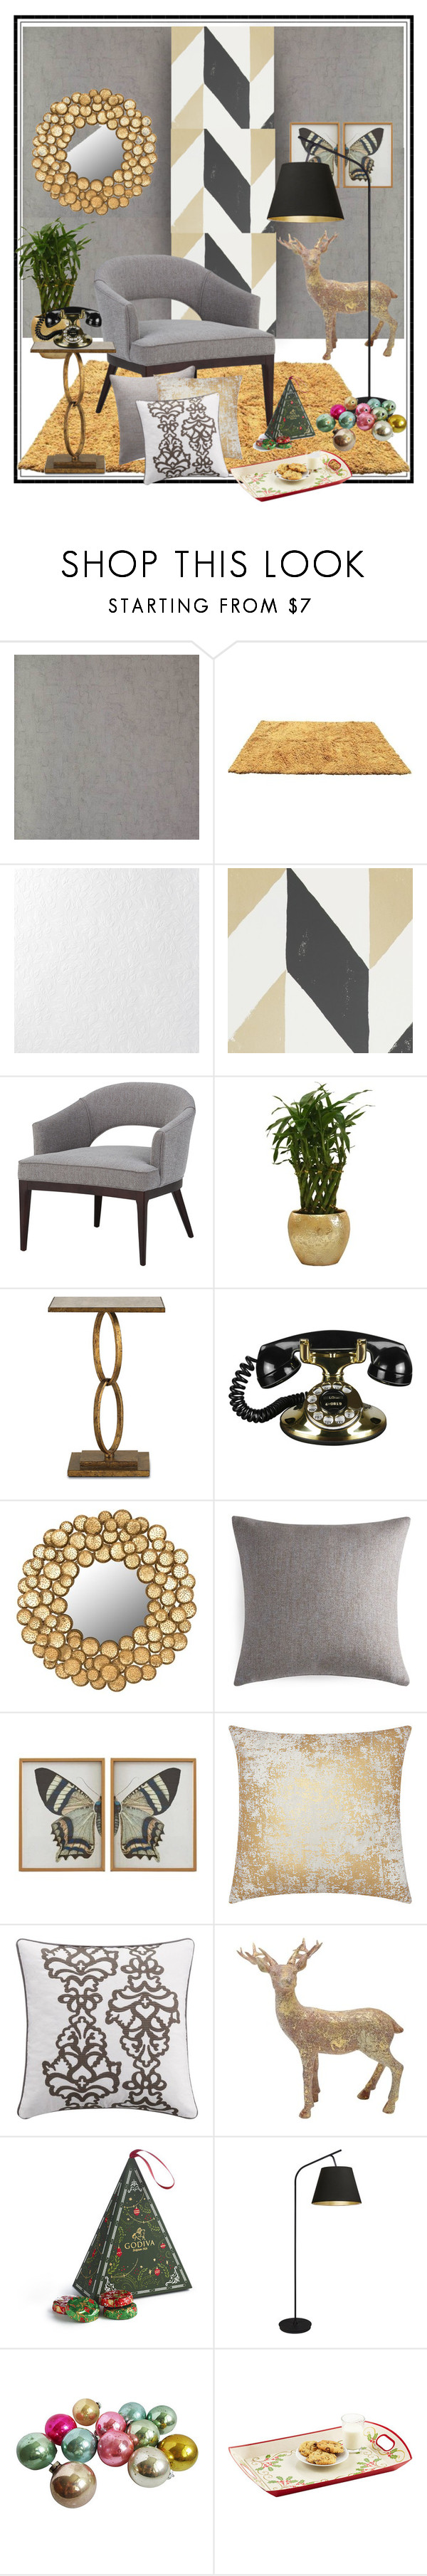 """COZY CORNER!!!"" by kskafida ❤ liked on Polyvore featuring interior, interiors, interior design, home, home decor, interior decorating, Graham & Brown, Simpli Home, Safavieh and Pratesi"